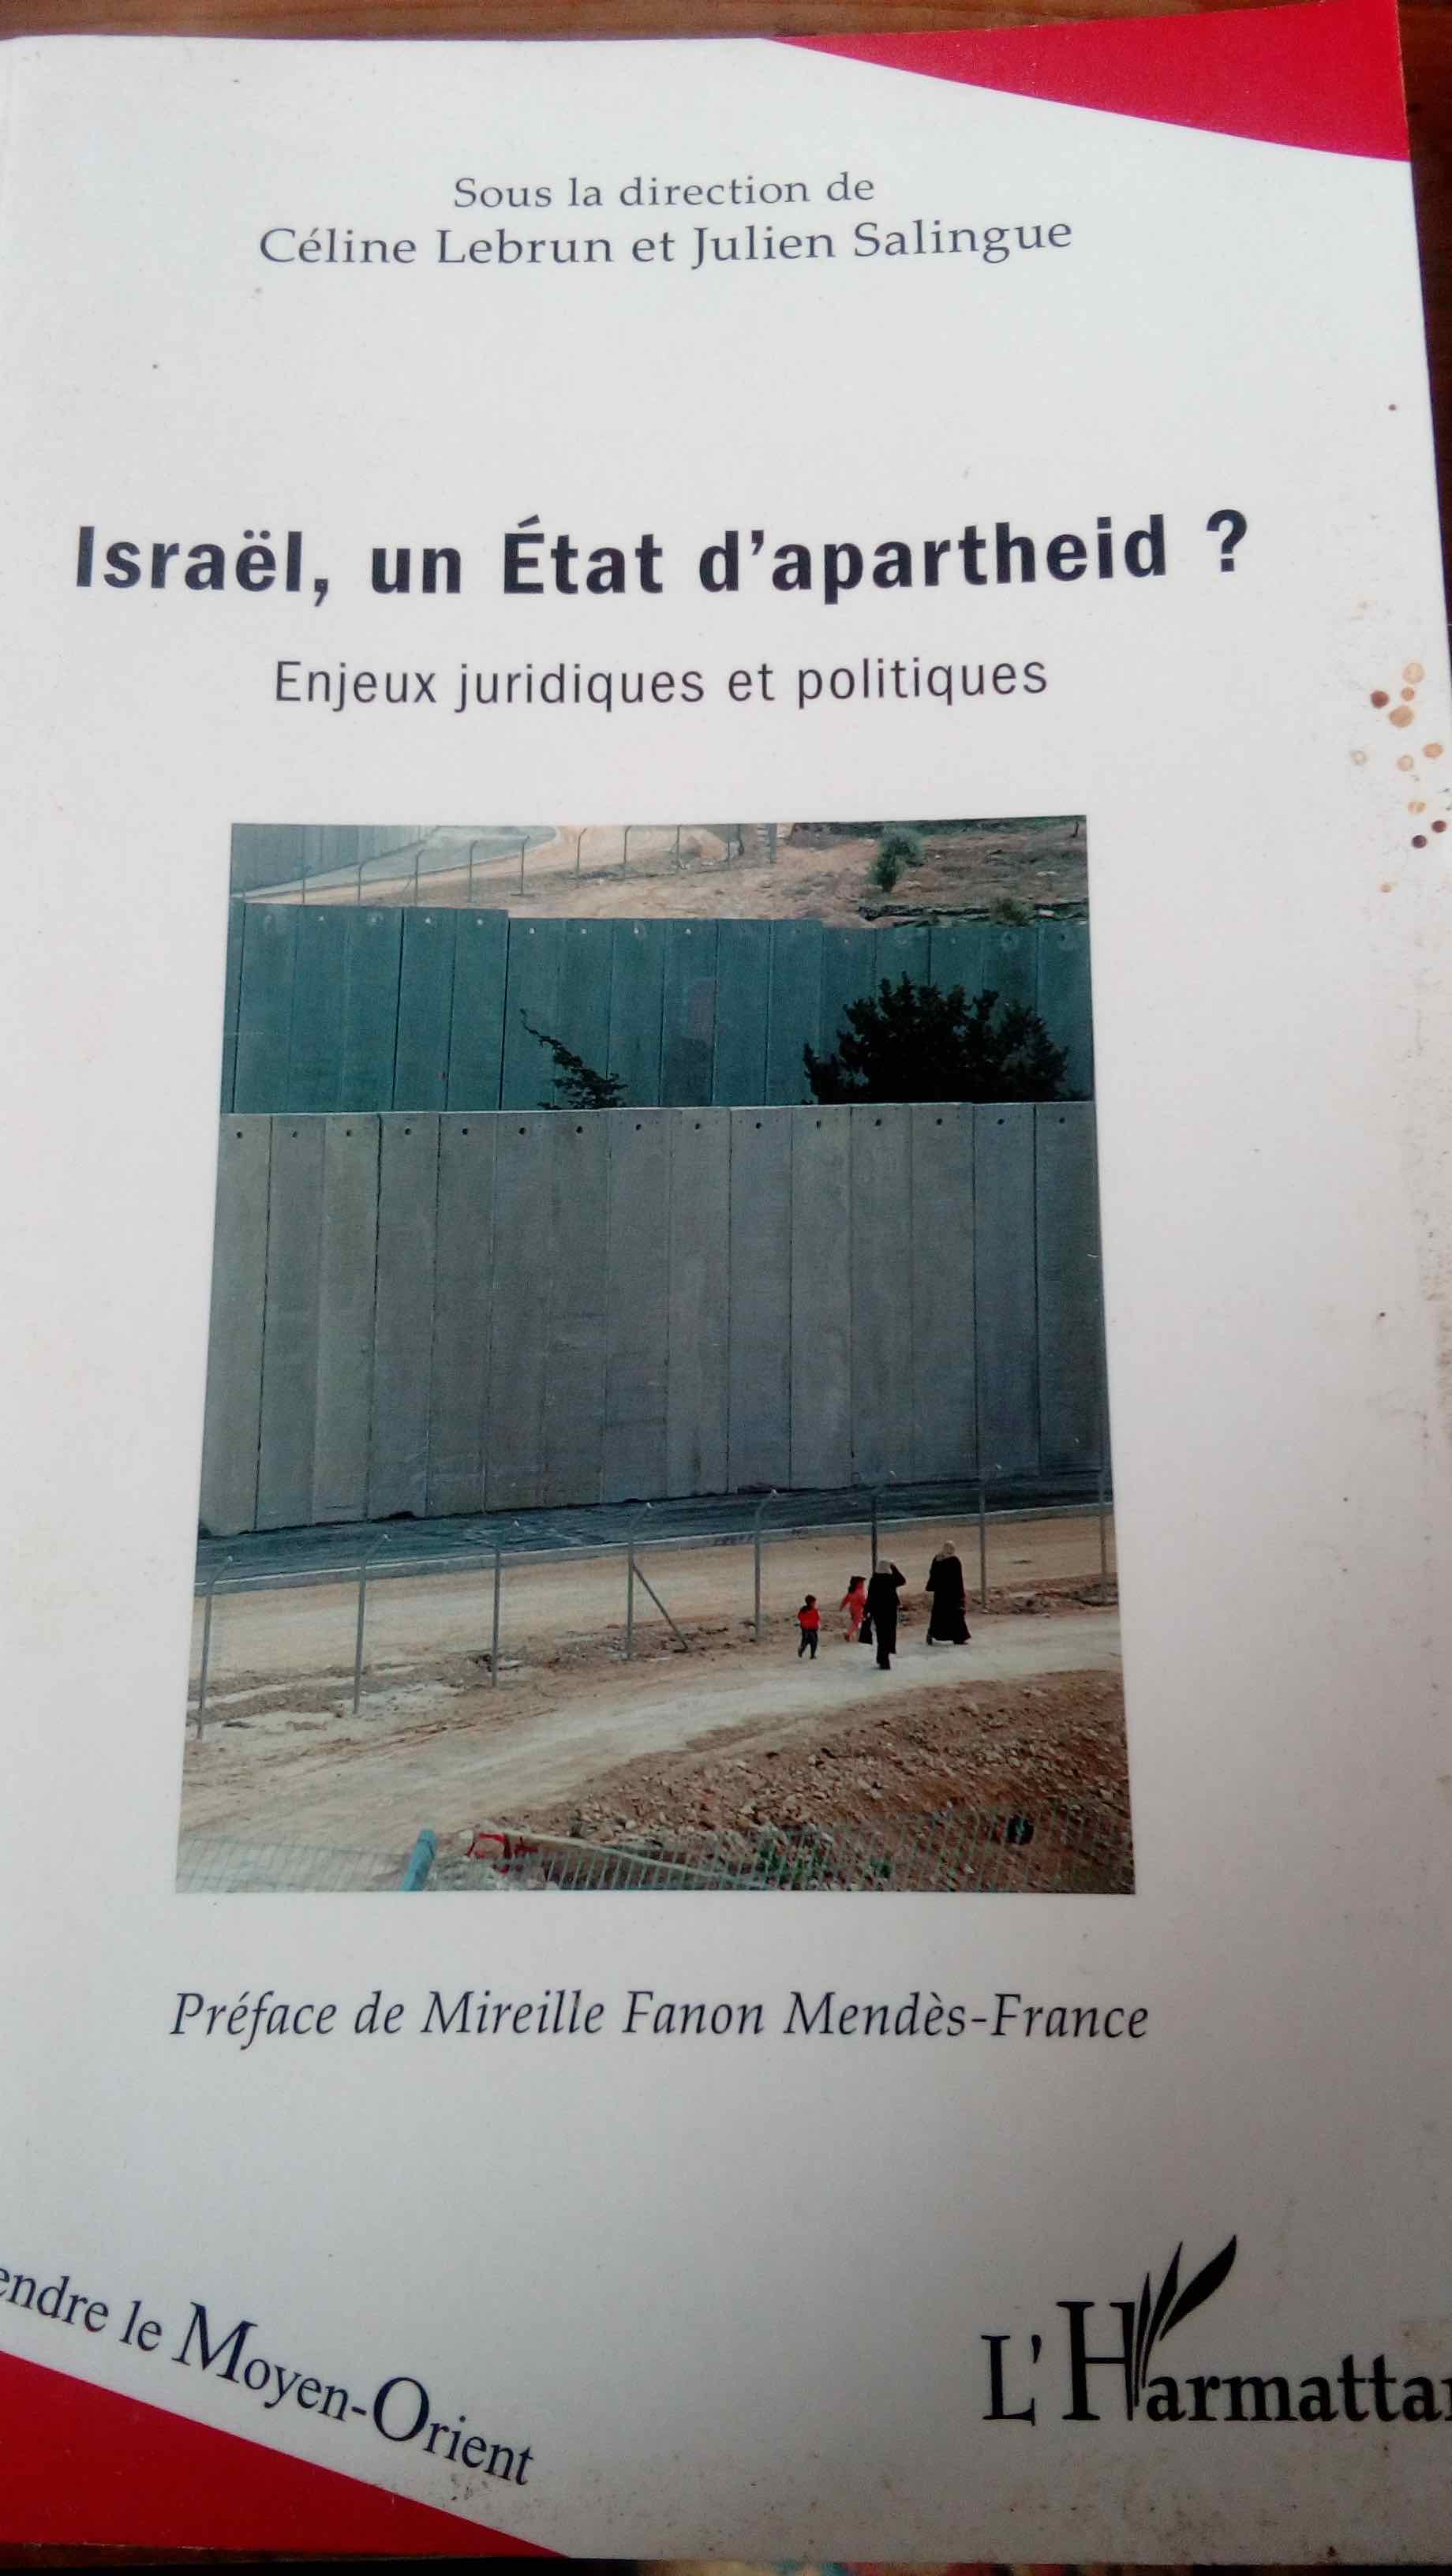 ISRAËL UN ÉTAT D'APARTHEID ?